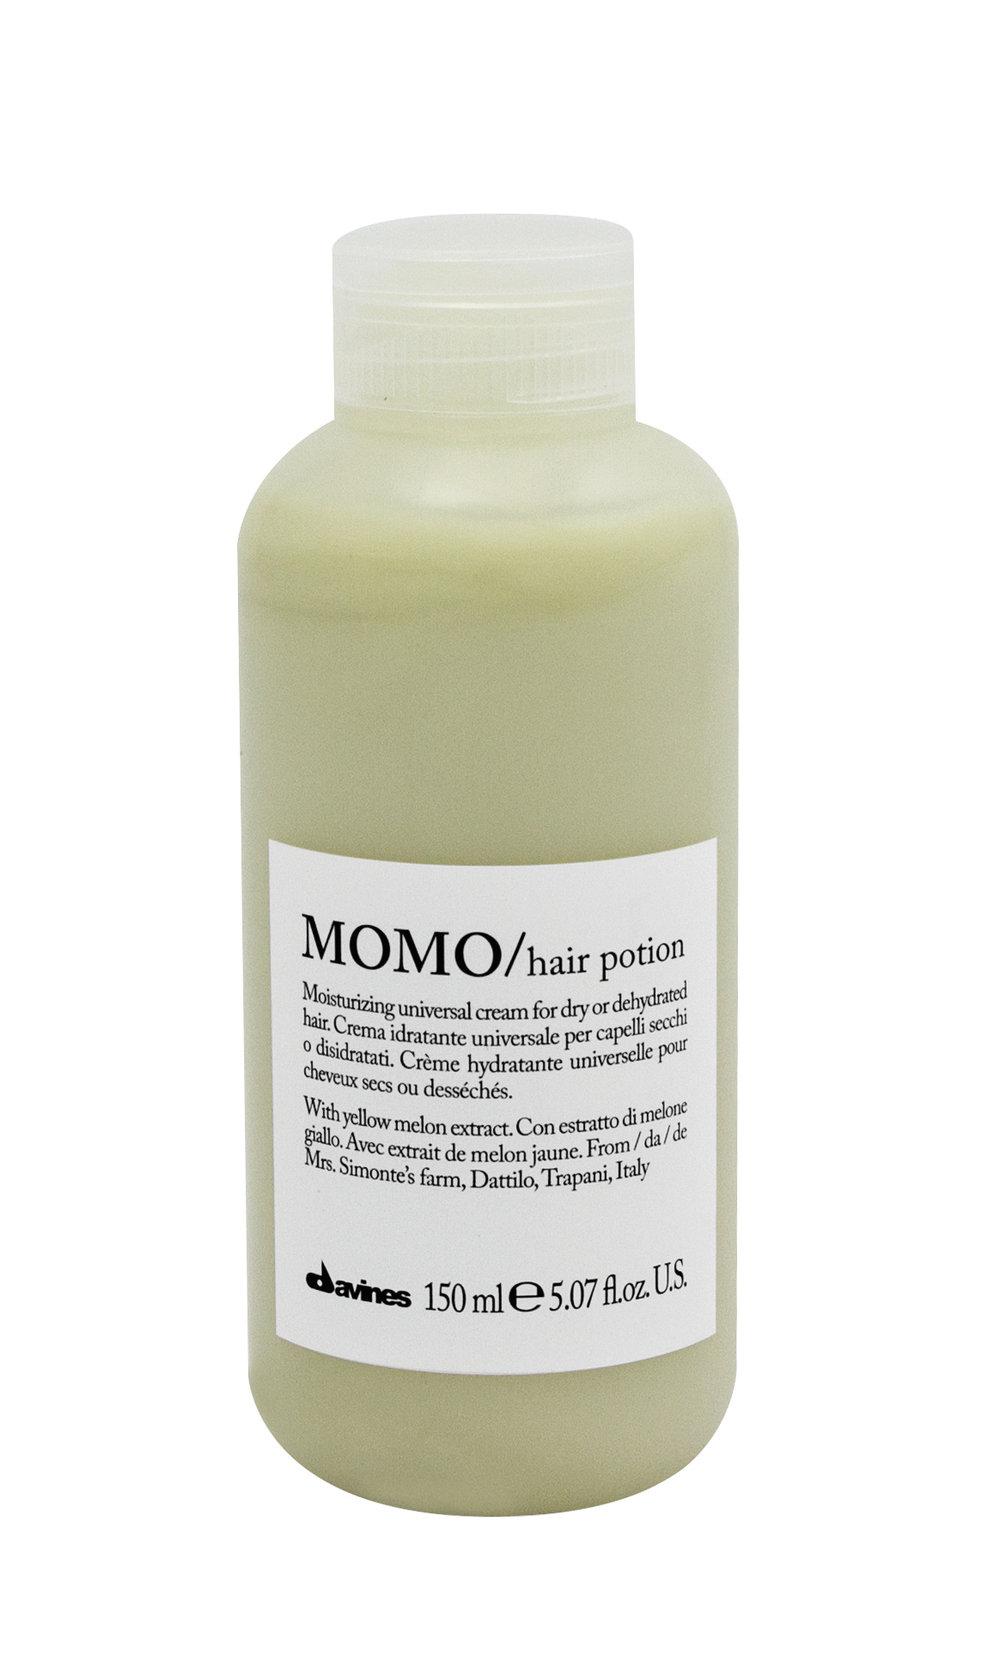 ech momo hair potion.jpg